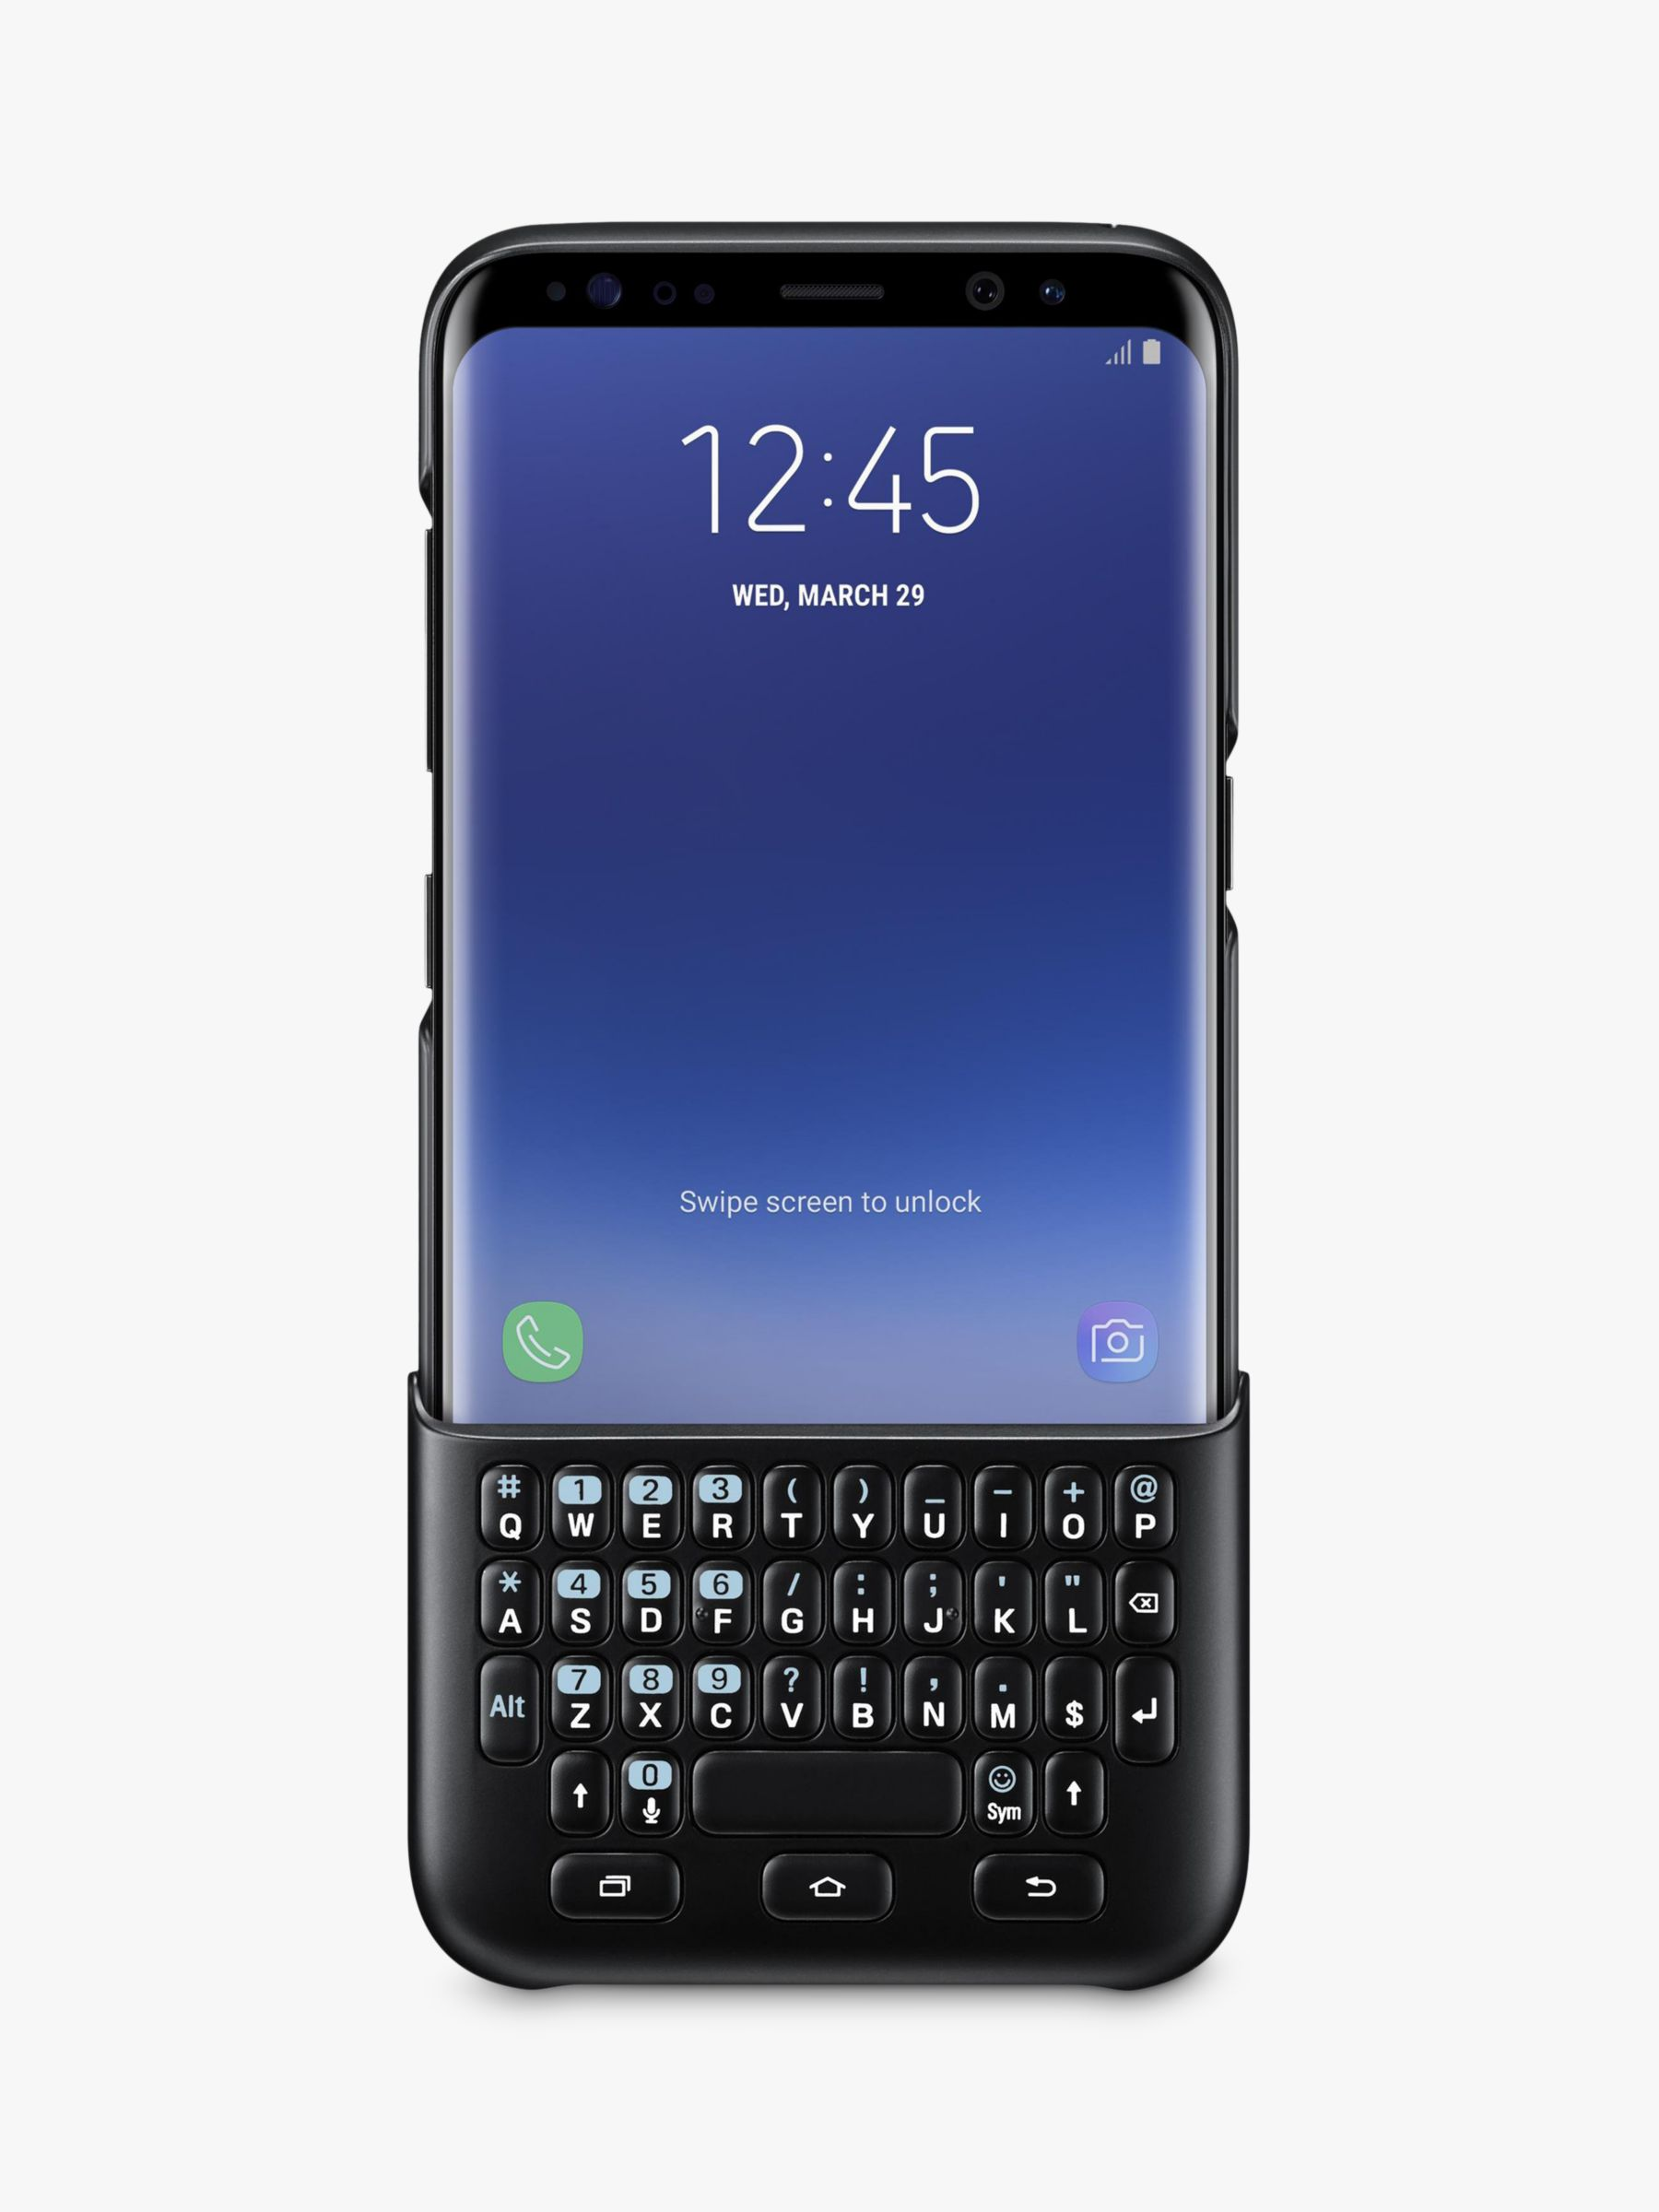 d591b7bb240 Samsung Galaxy S8 Keyboard Cover at John Lewis & Partners